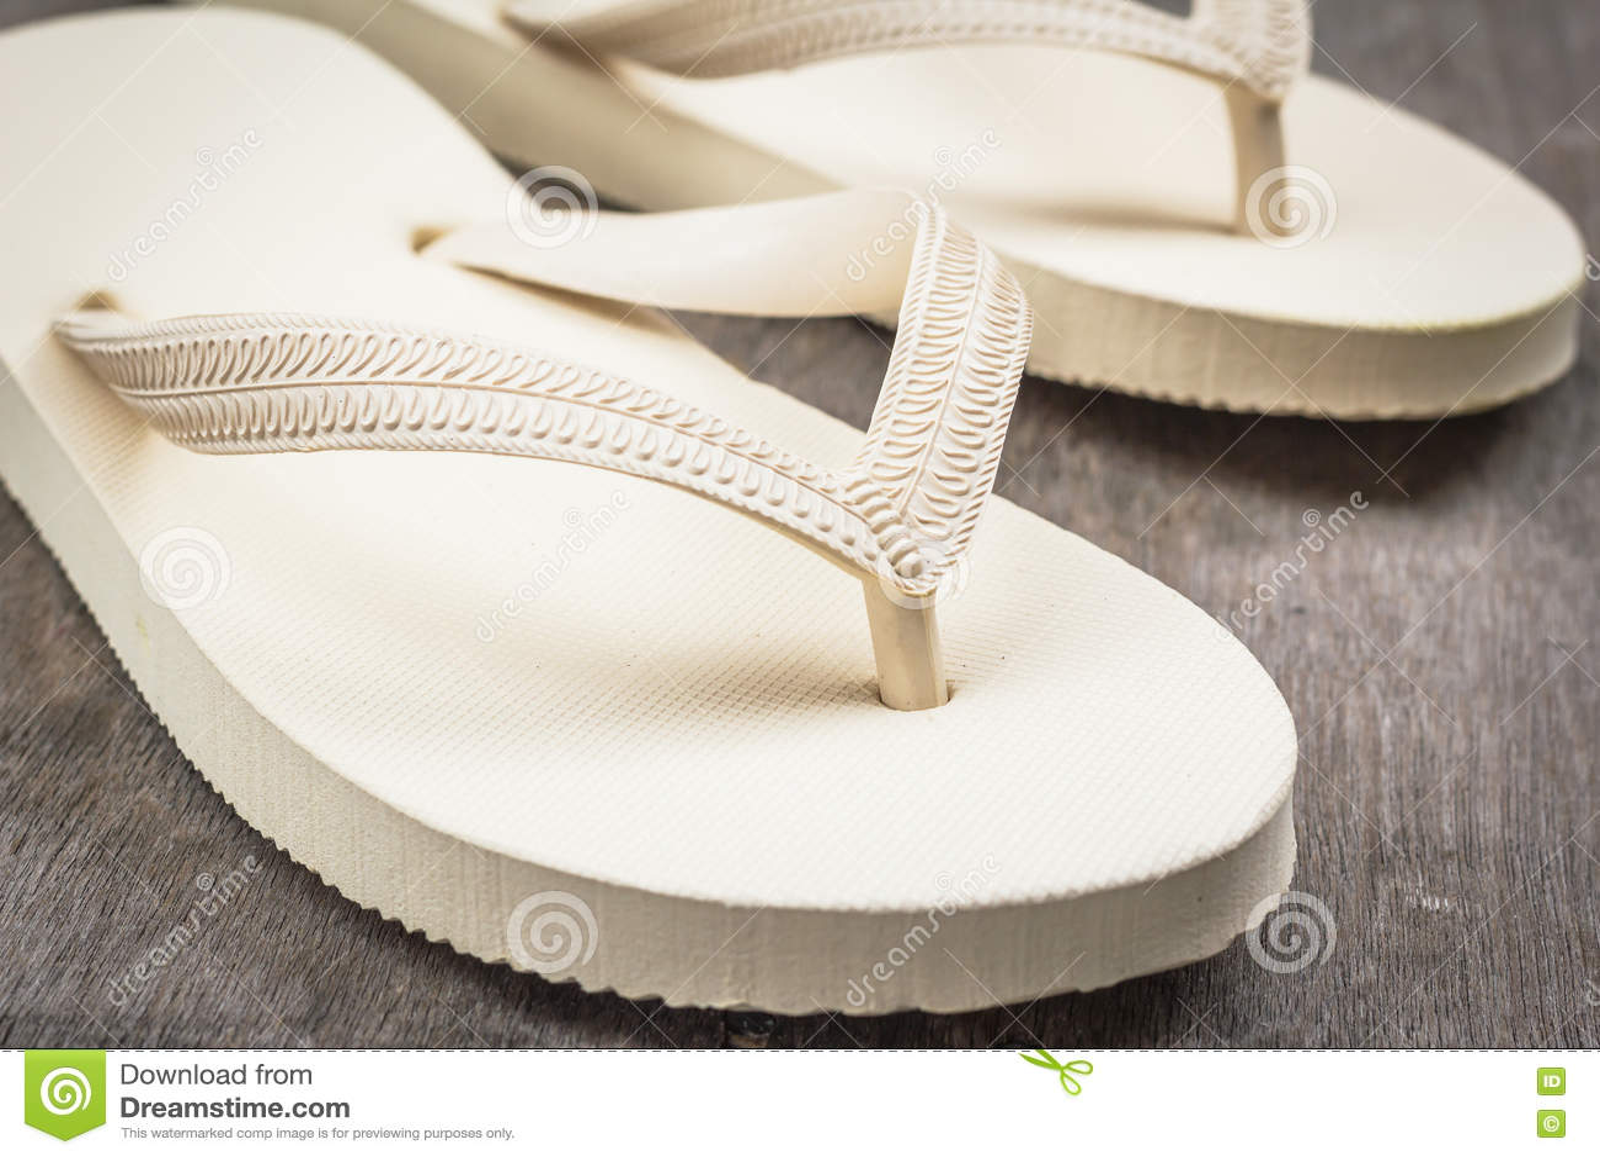 Flip-flops cream color.